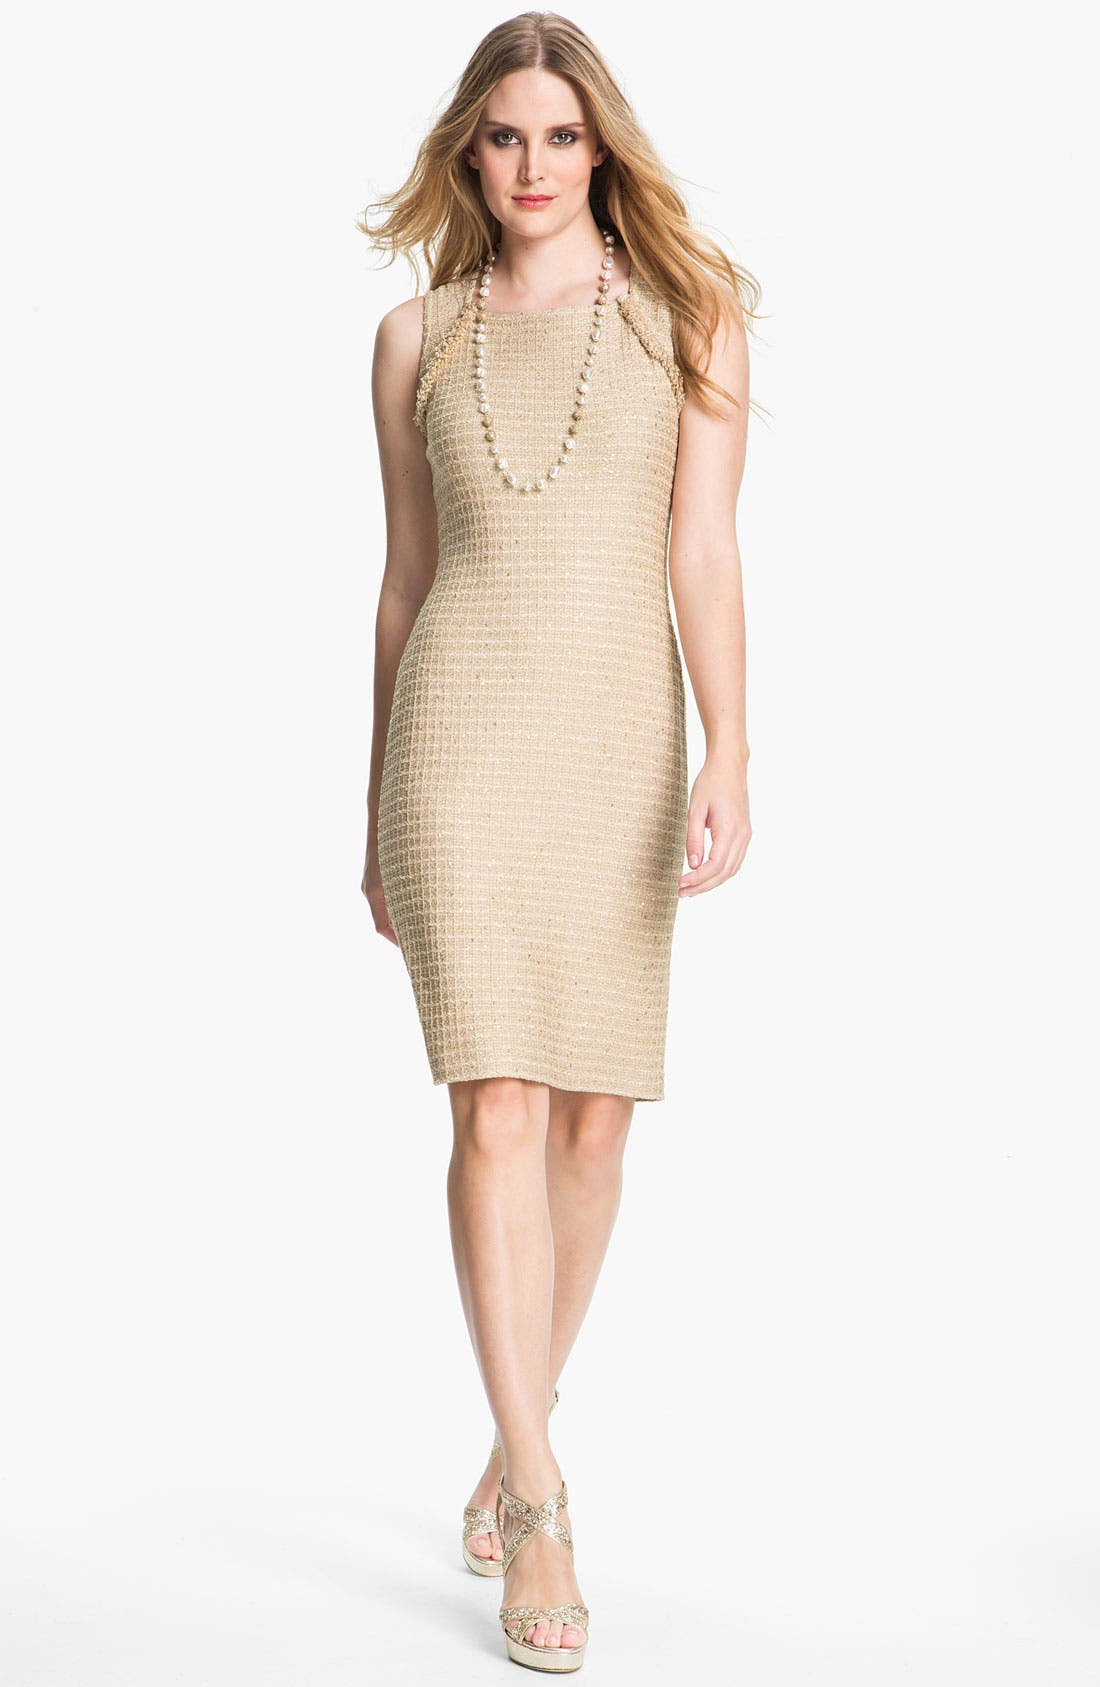 Main Image - St. John Collection Sequin Metallic Knit Dress